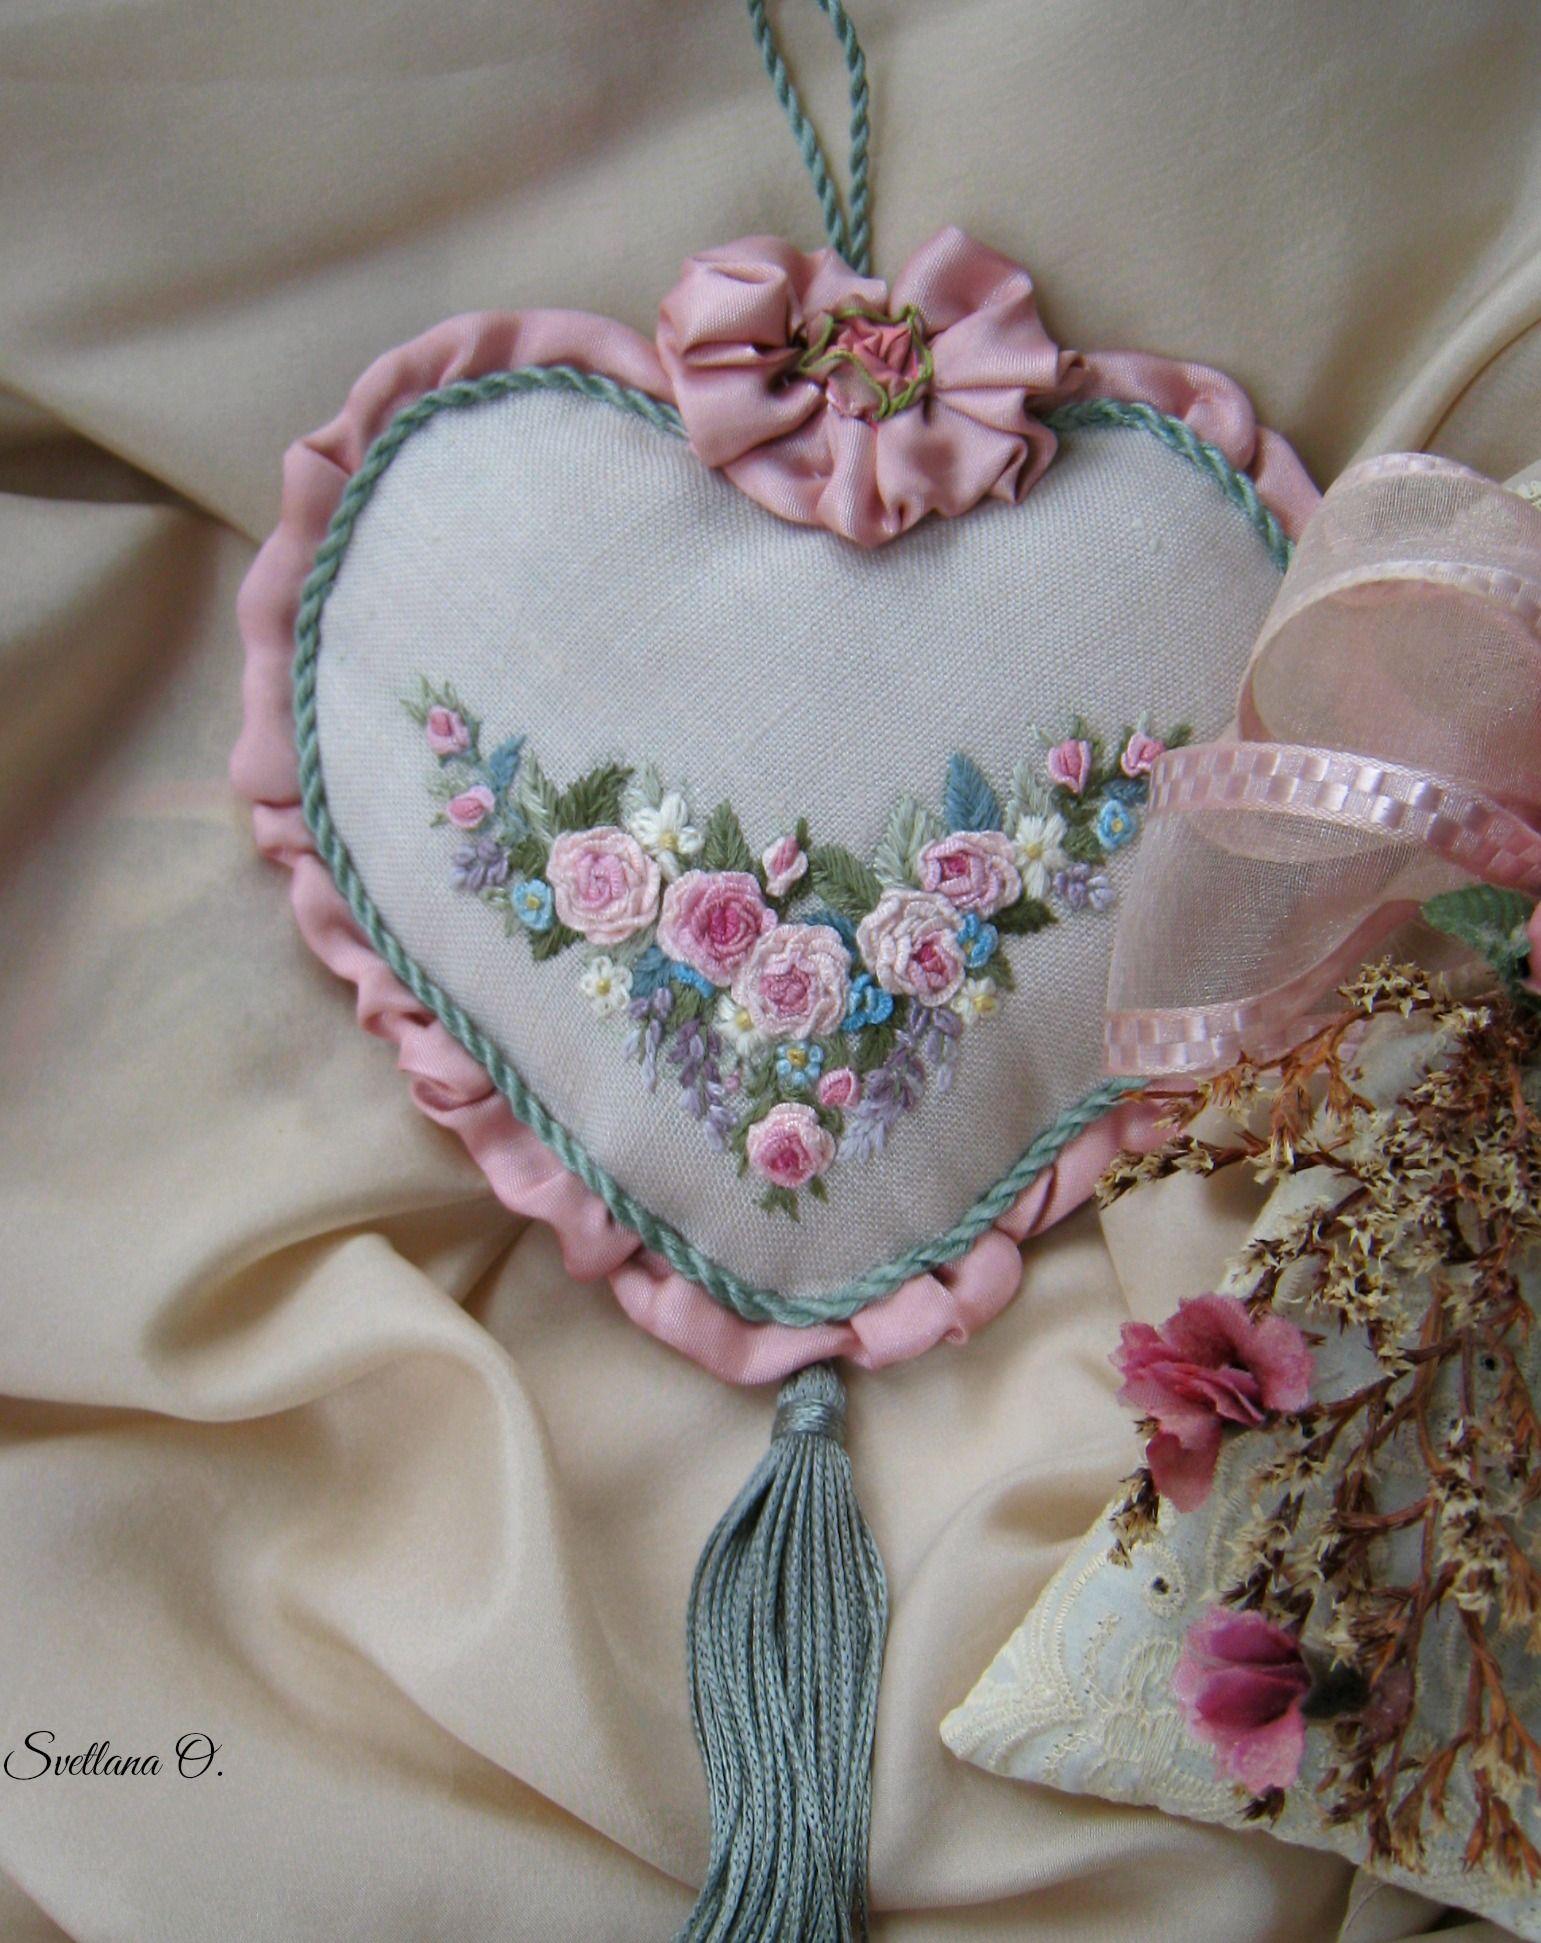 Old-fashioned sachet. Made by Svetlana O. | Pincushions and sachets ...